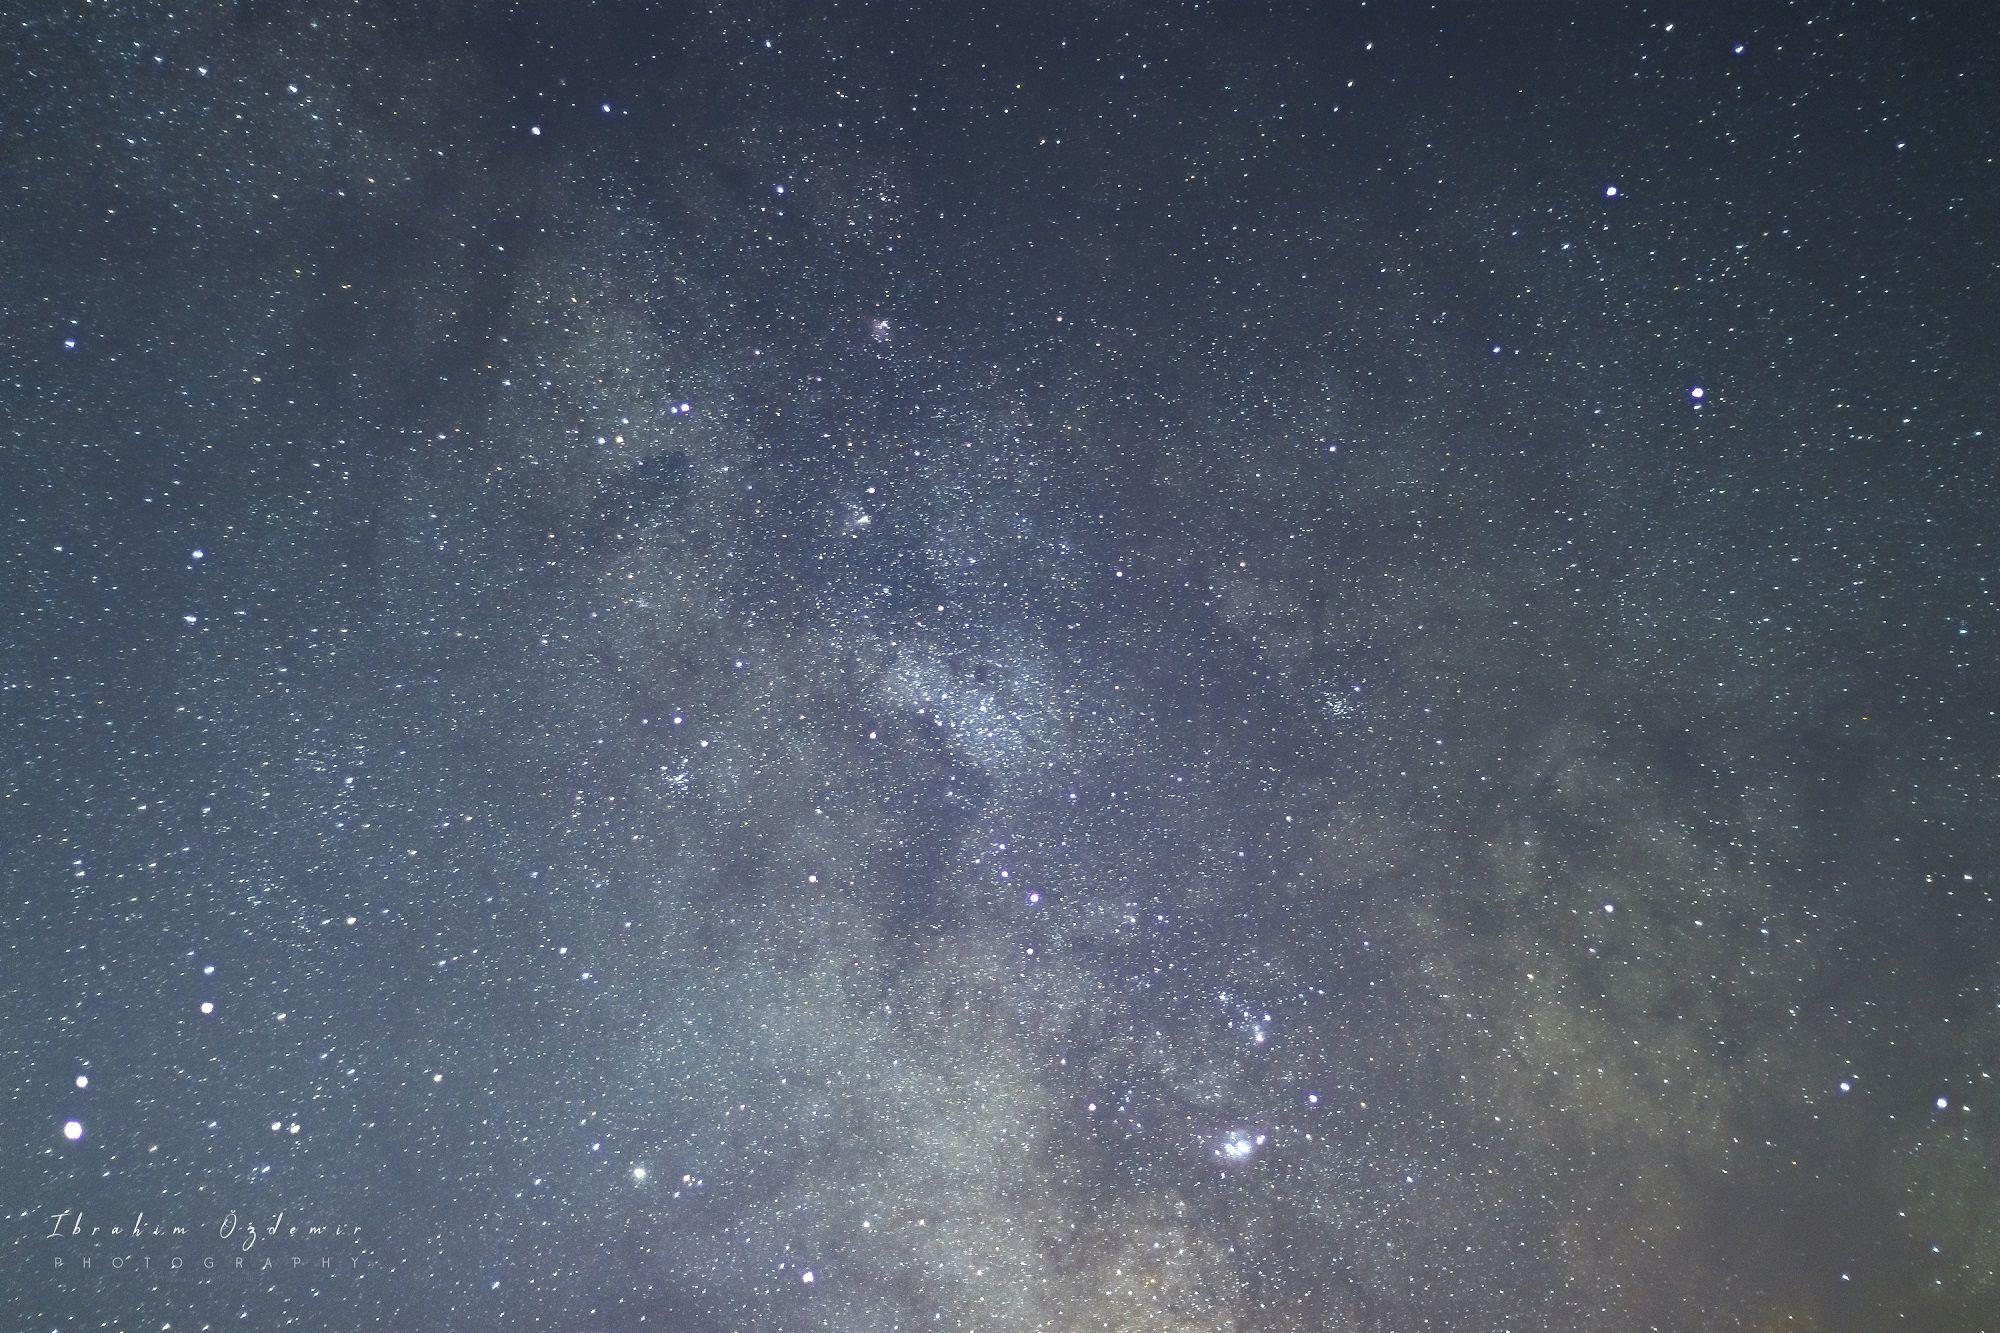 galaxy-stacked-full-jpg.550015